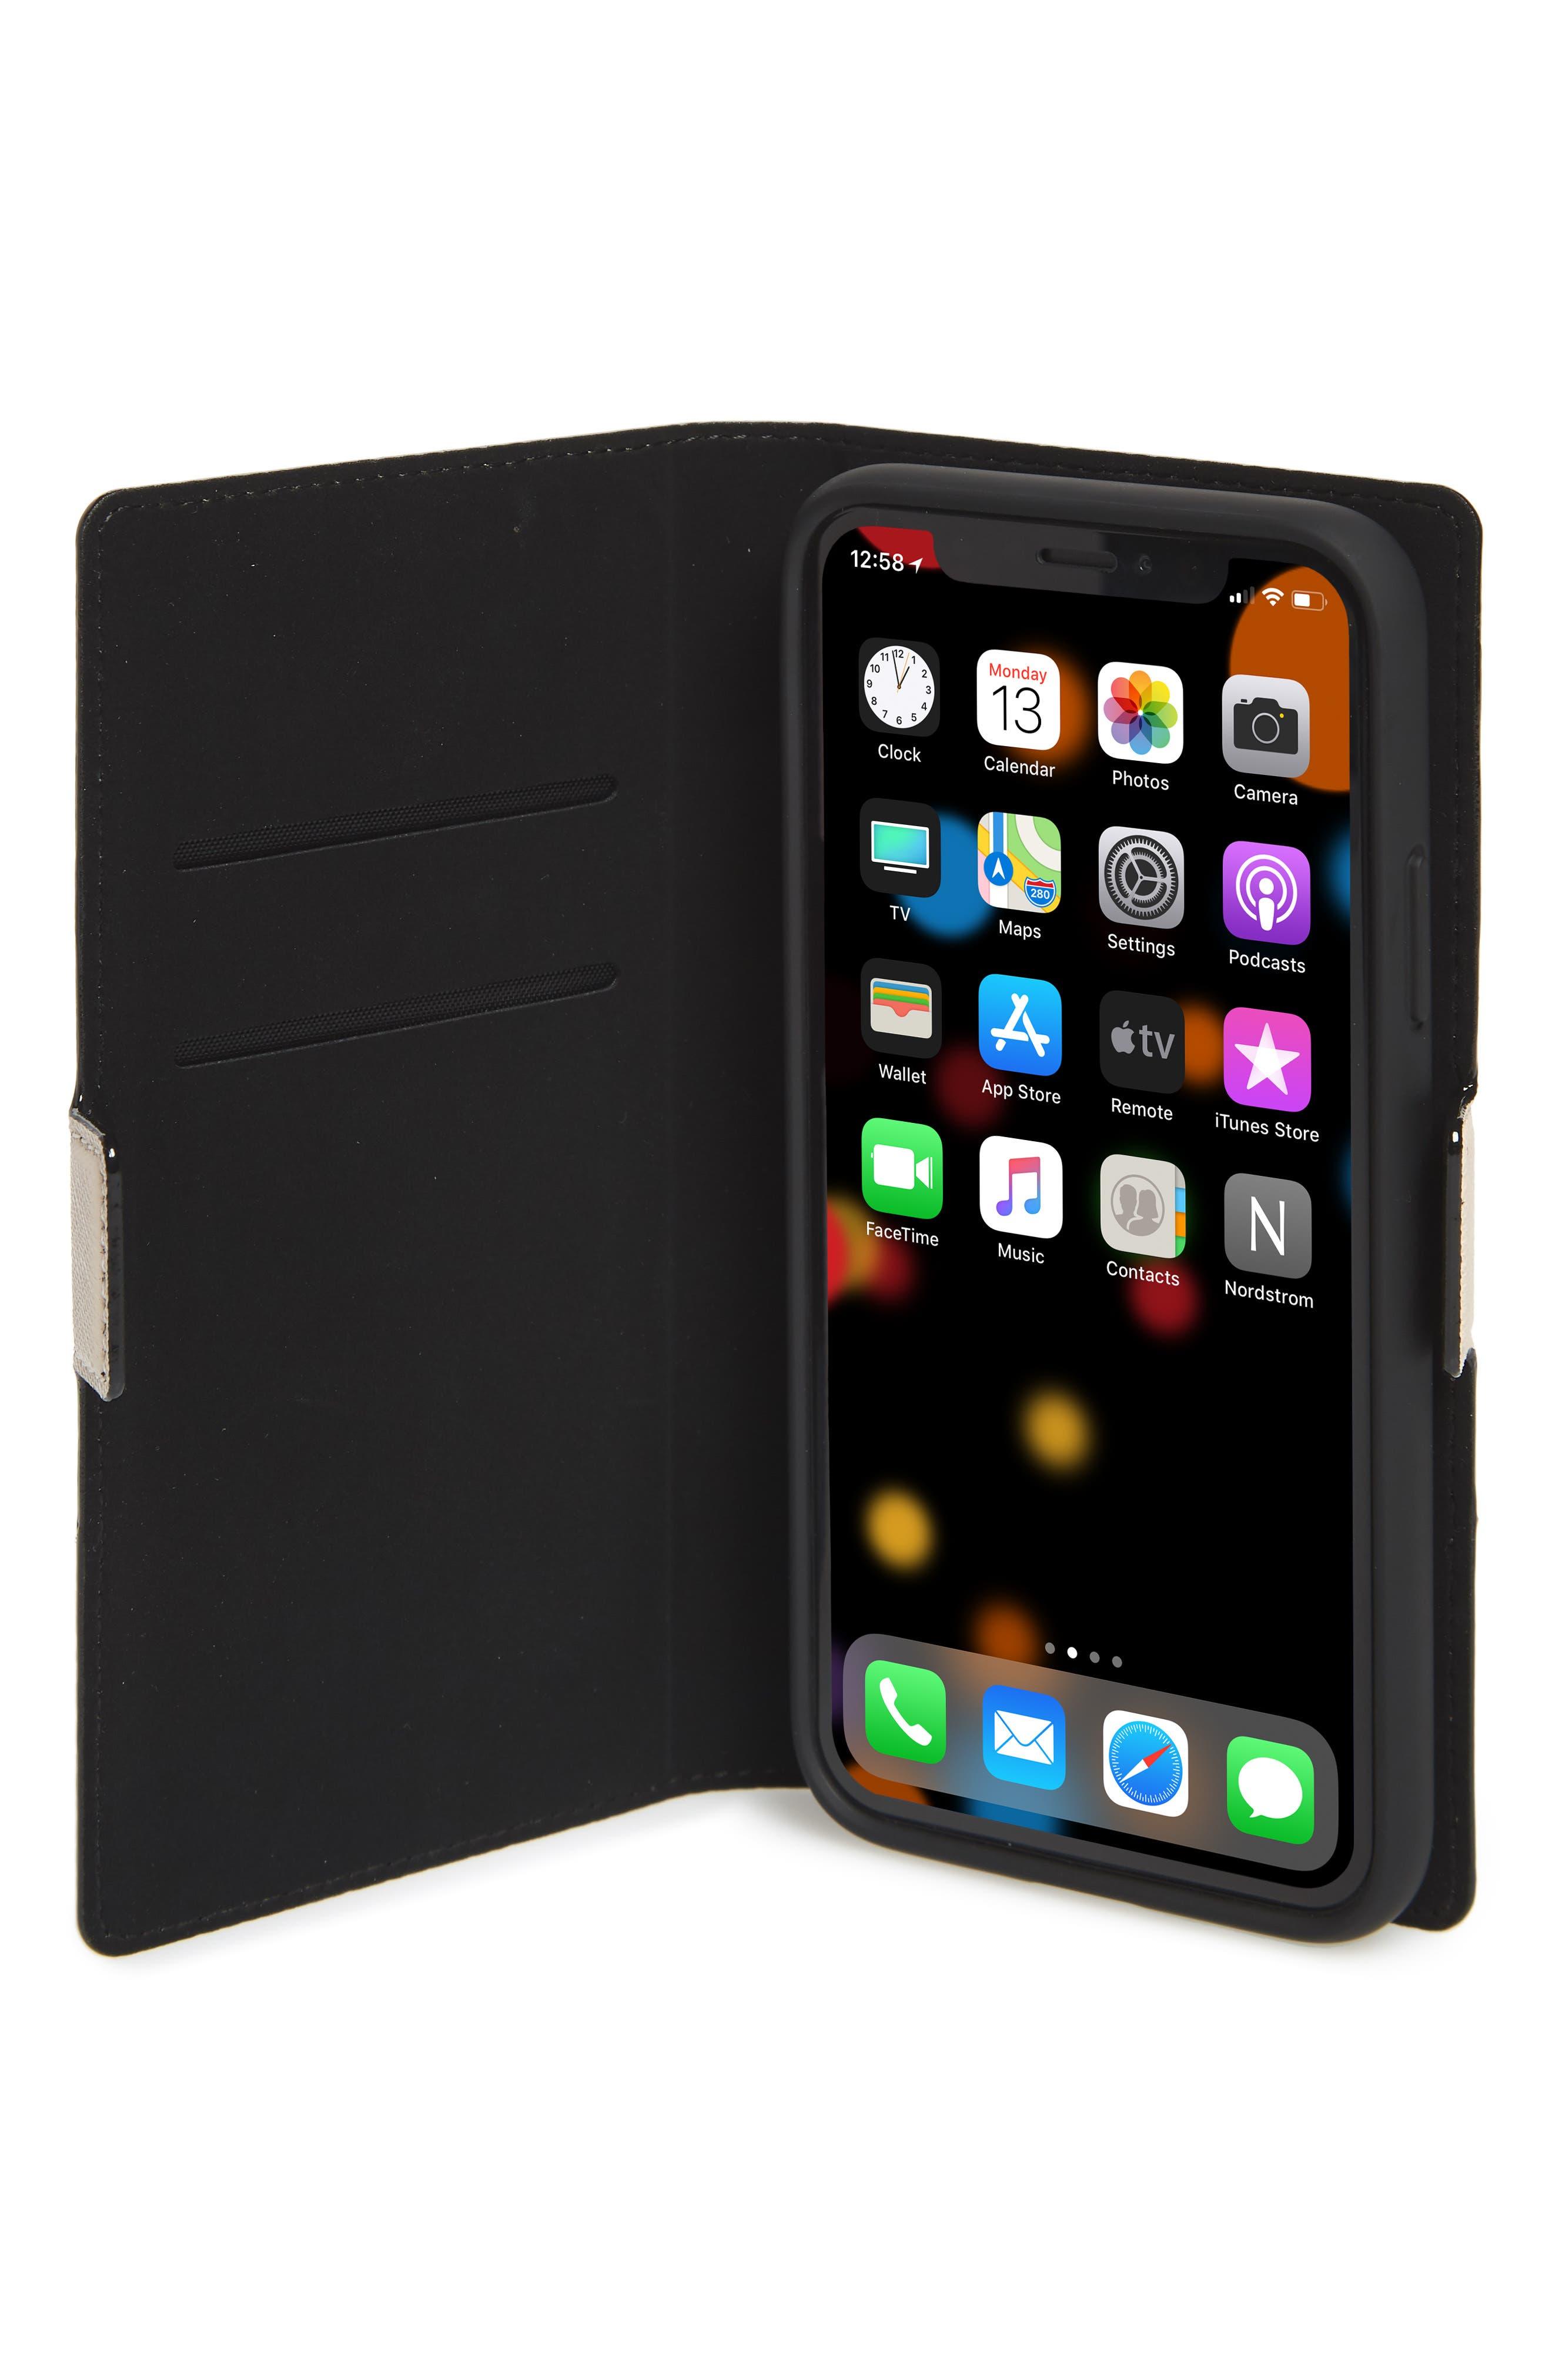 KATE SPADE NEW YORK,                             iPhone X/Xs/Xs Max & XR magnetic wrap folio case,                             Alternate thumbnail 2, color,                             BLACK/ TUSK